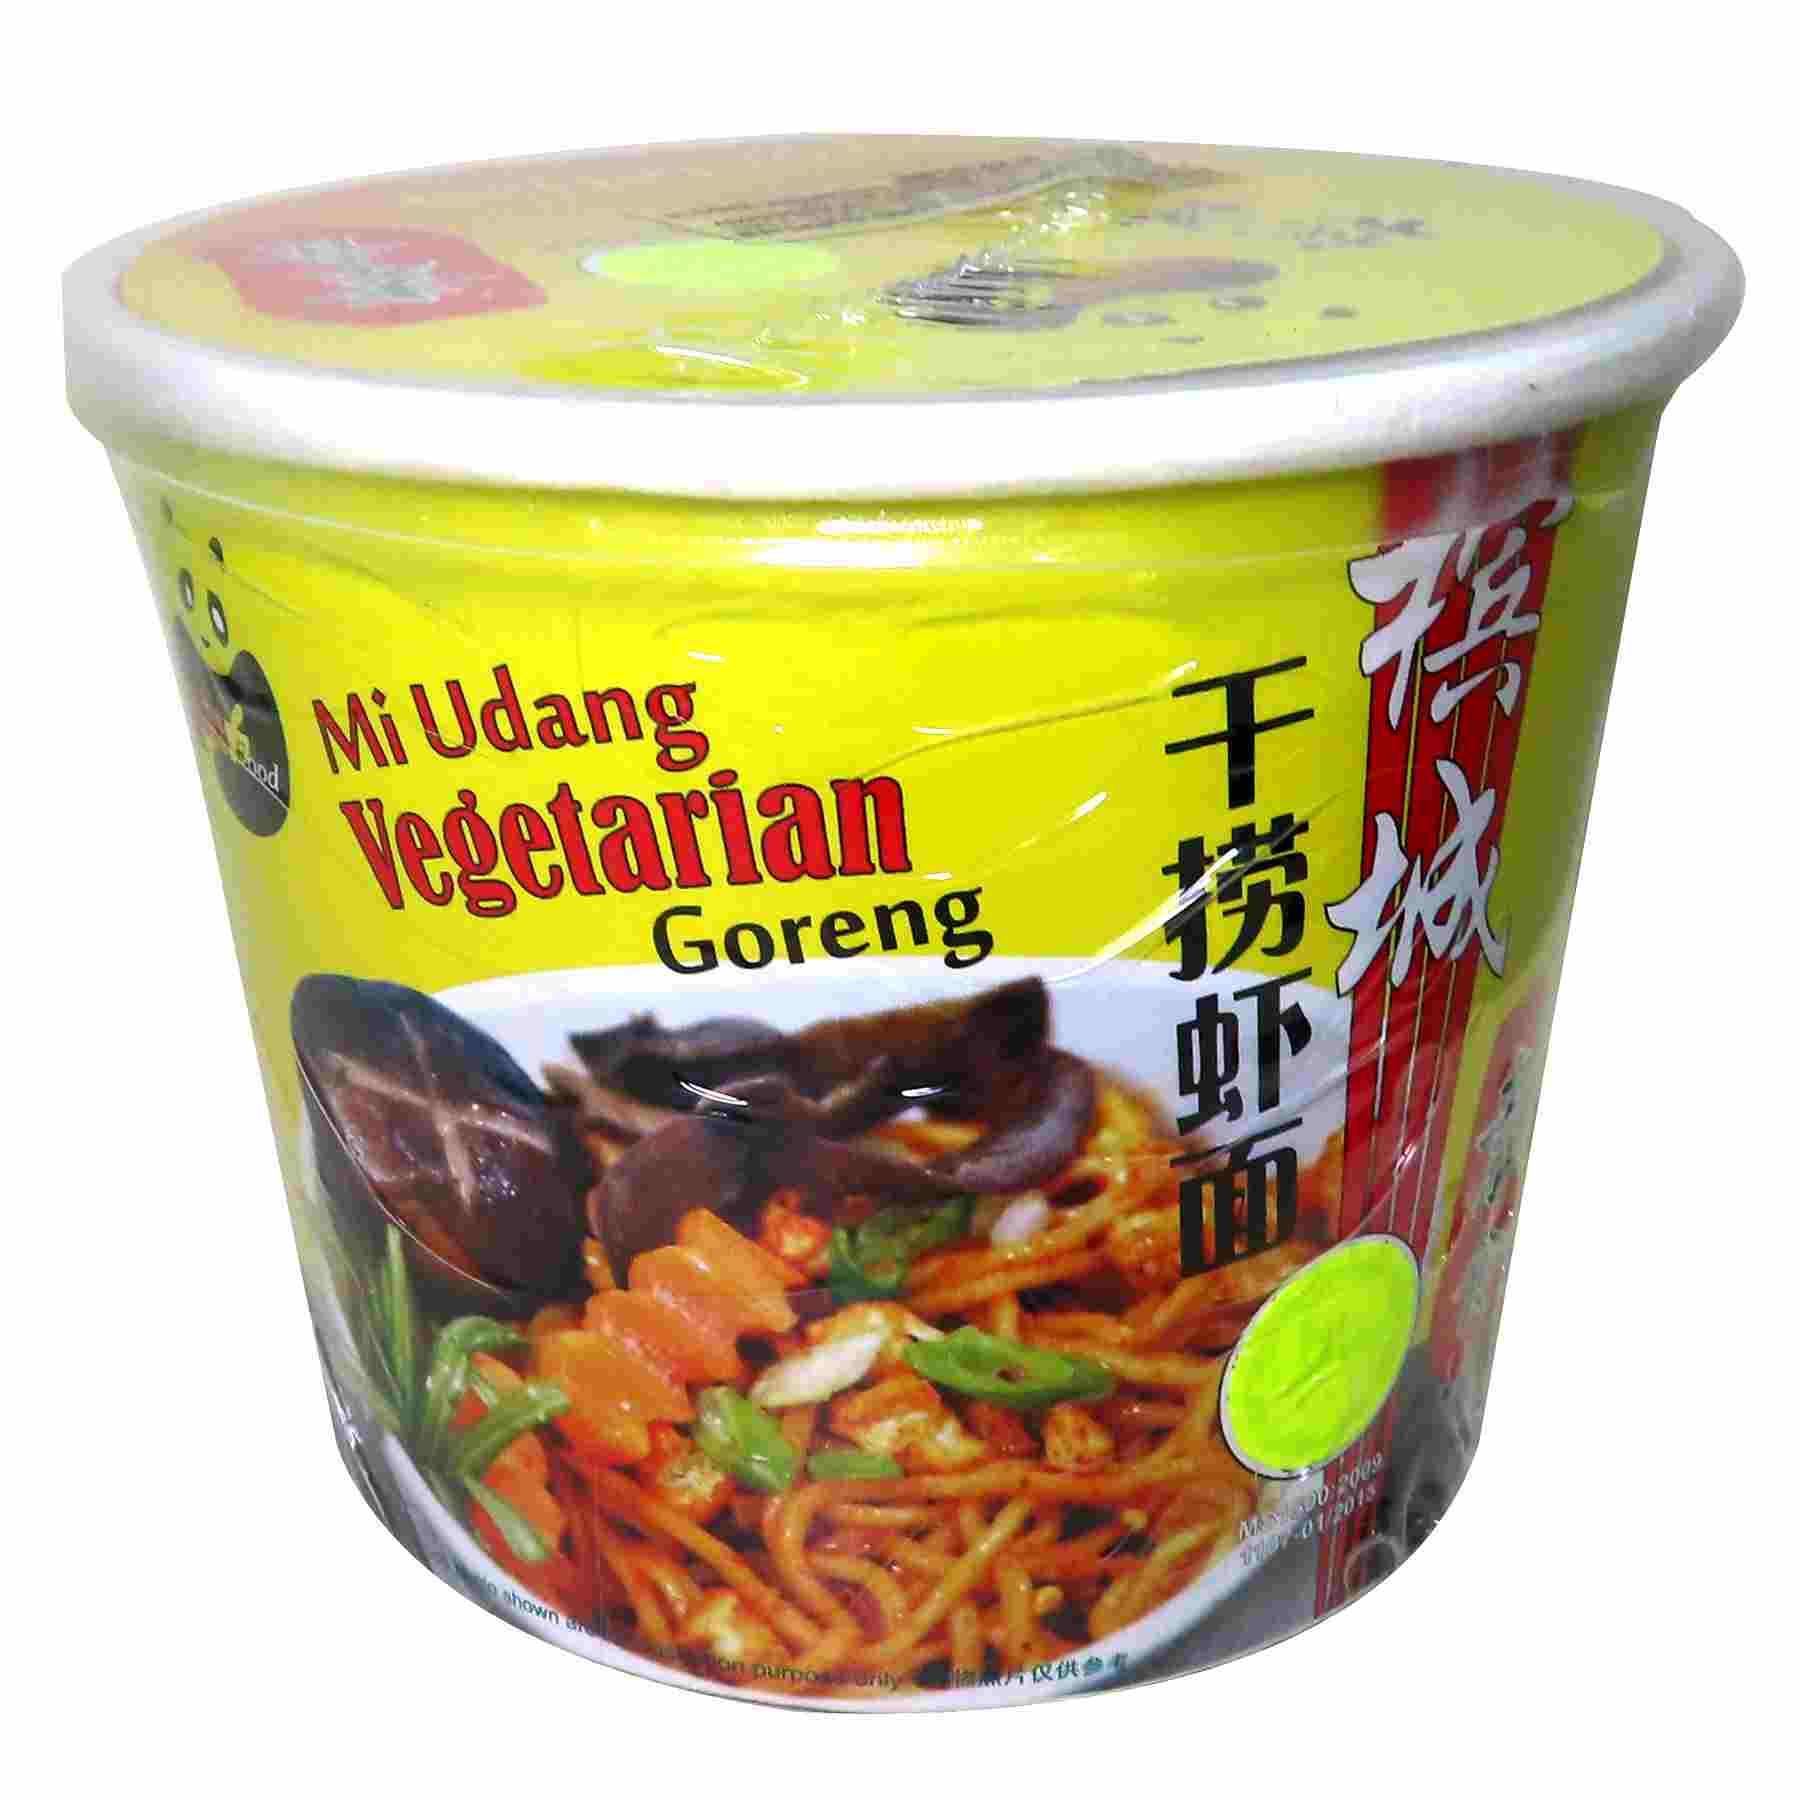 Image Omai Prawn Goreng Cup Noodle 槟城干捞虾面 (杯) 95grams